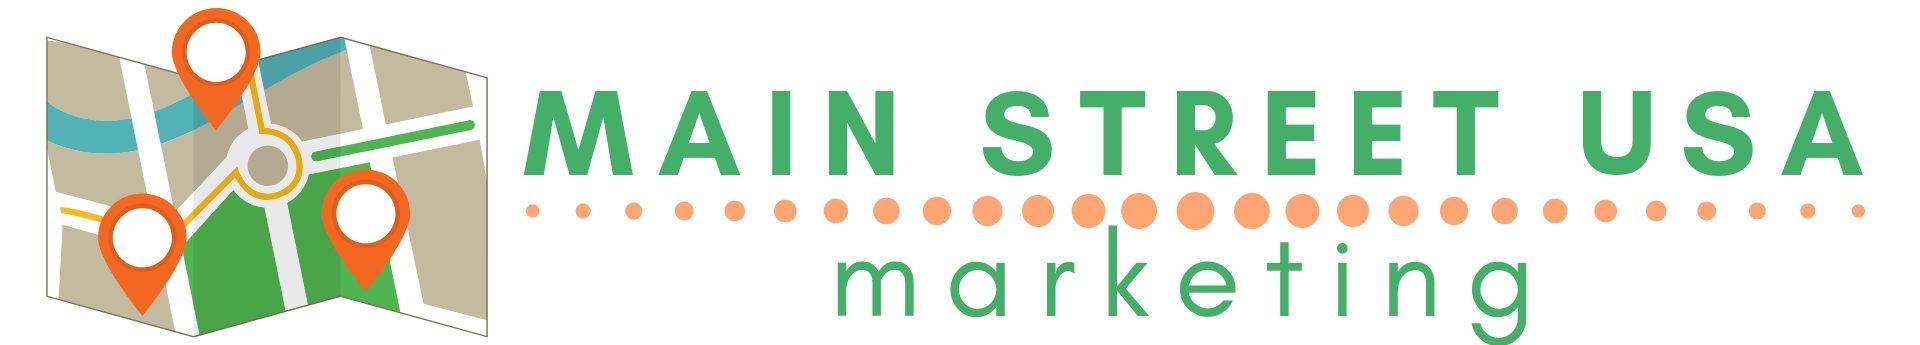 Main Street USA Marketing